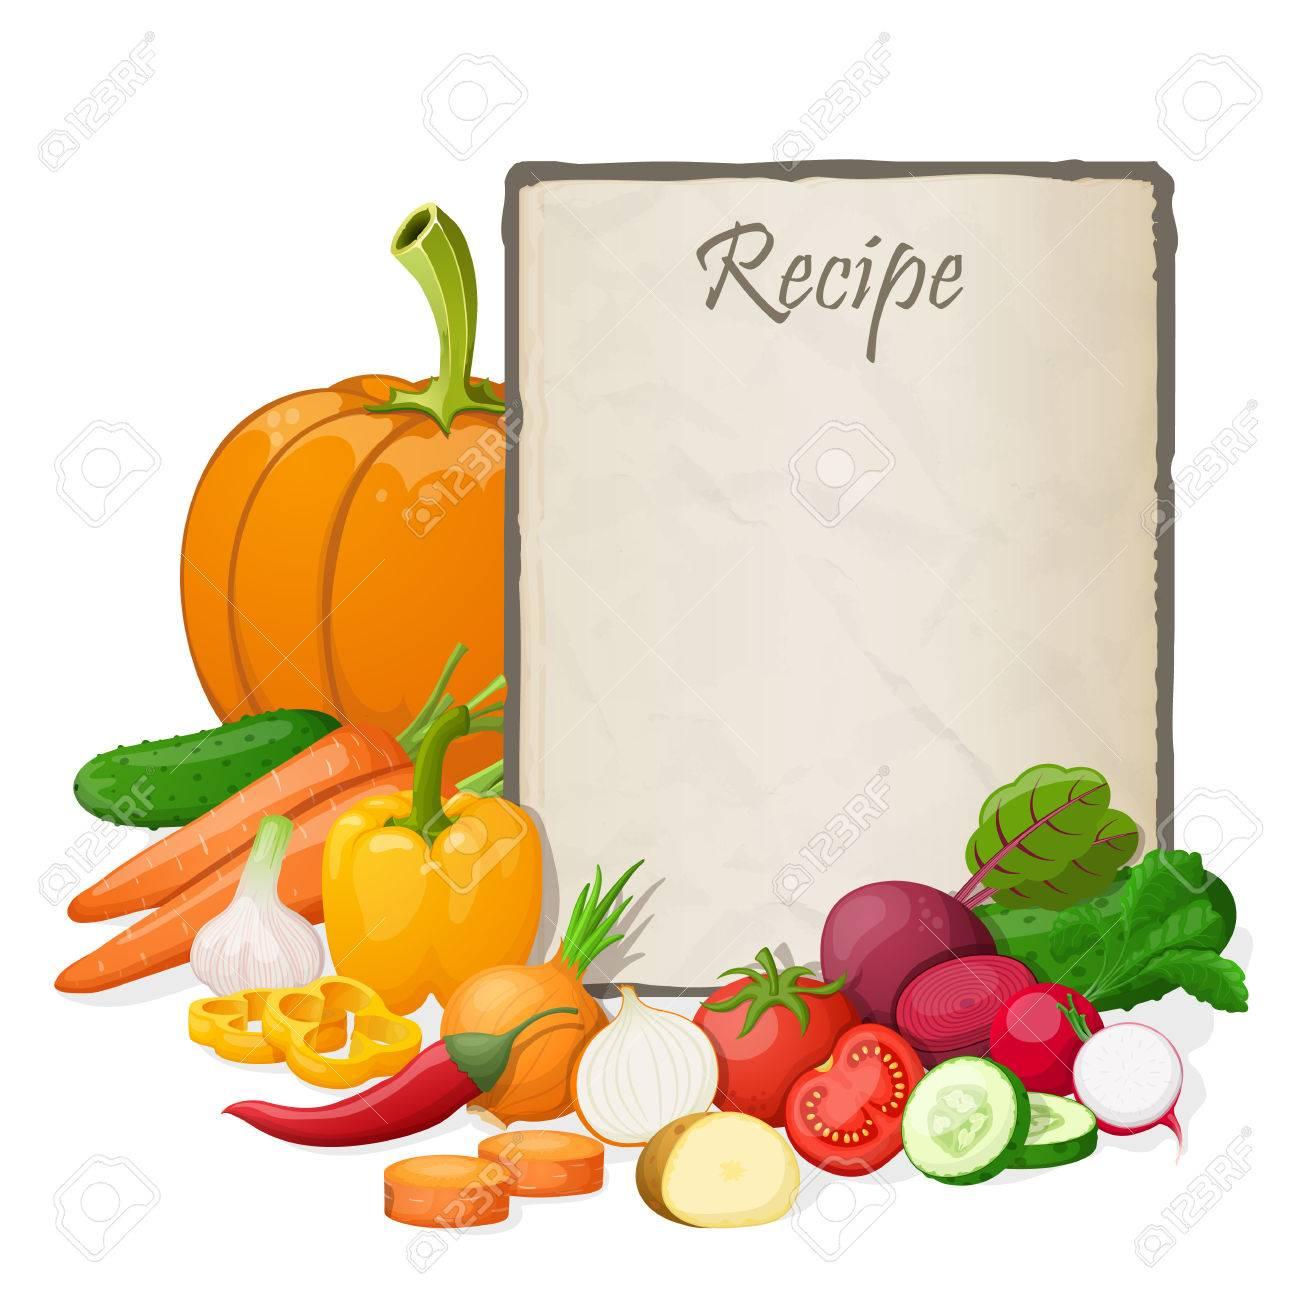 Modele Fiche Recette Cuisine Vierge Zm52 Montrealeast